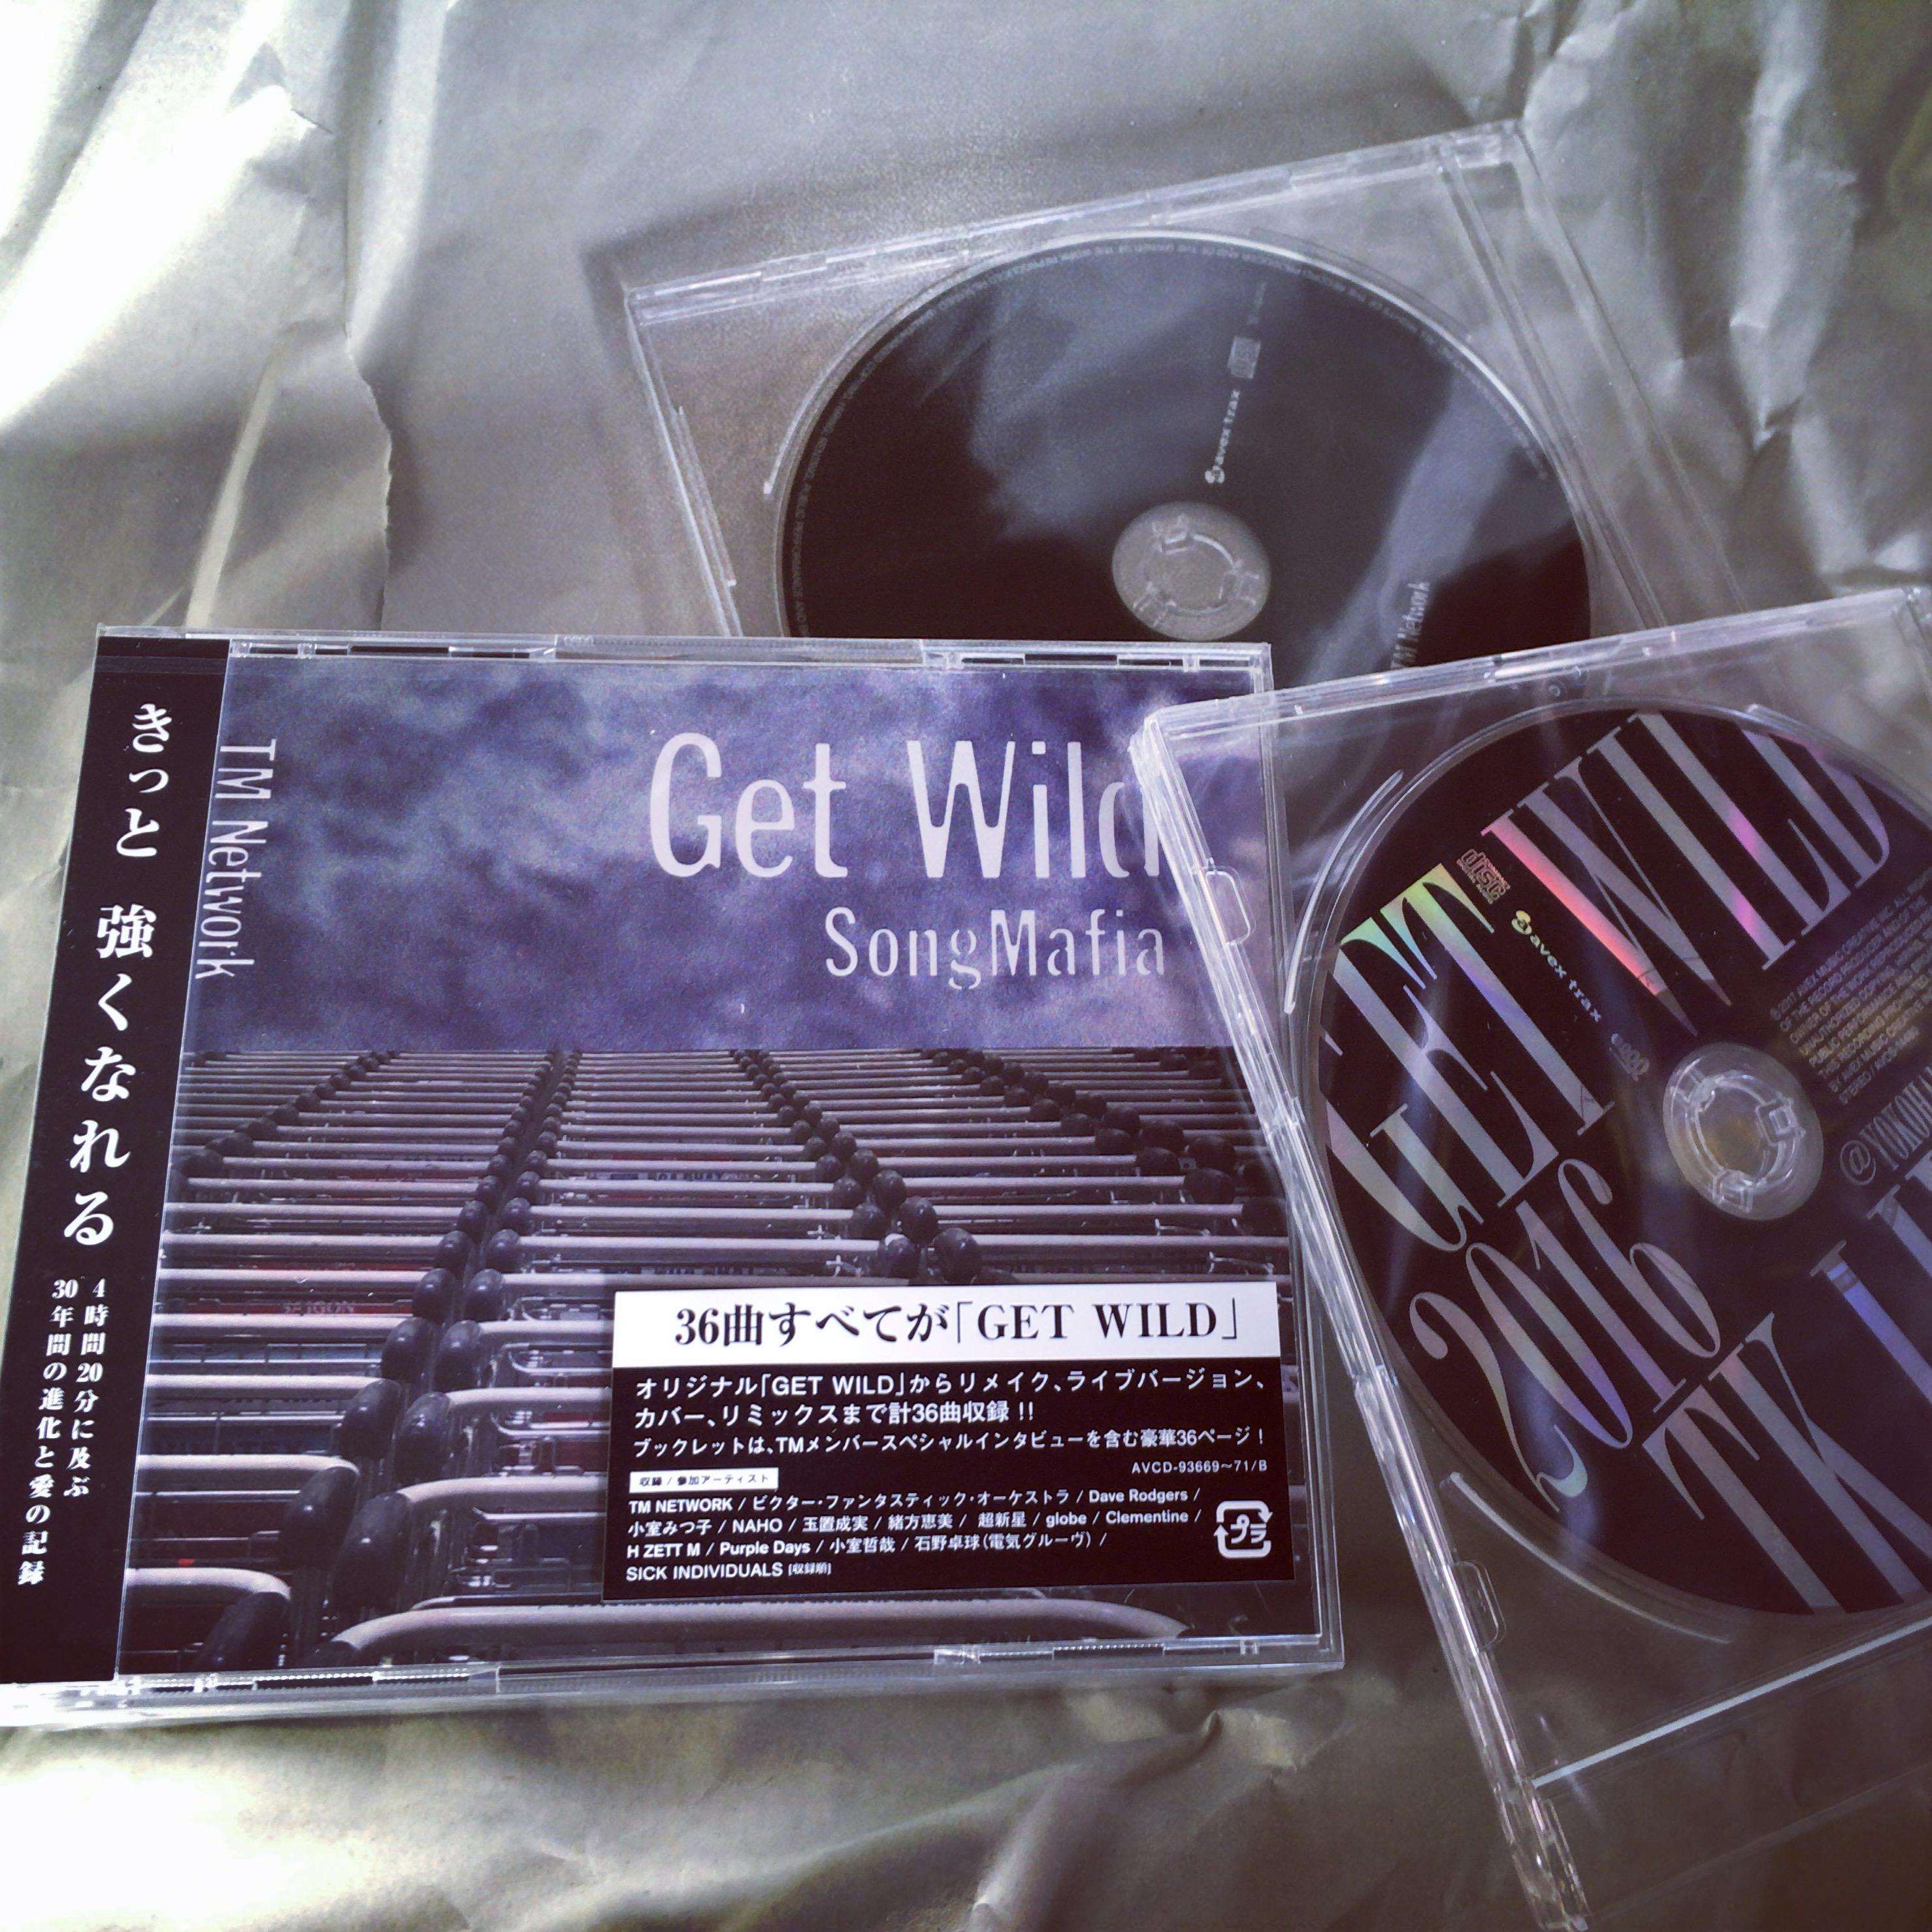 Get Wild Songmafia